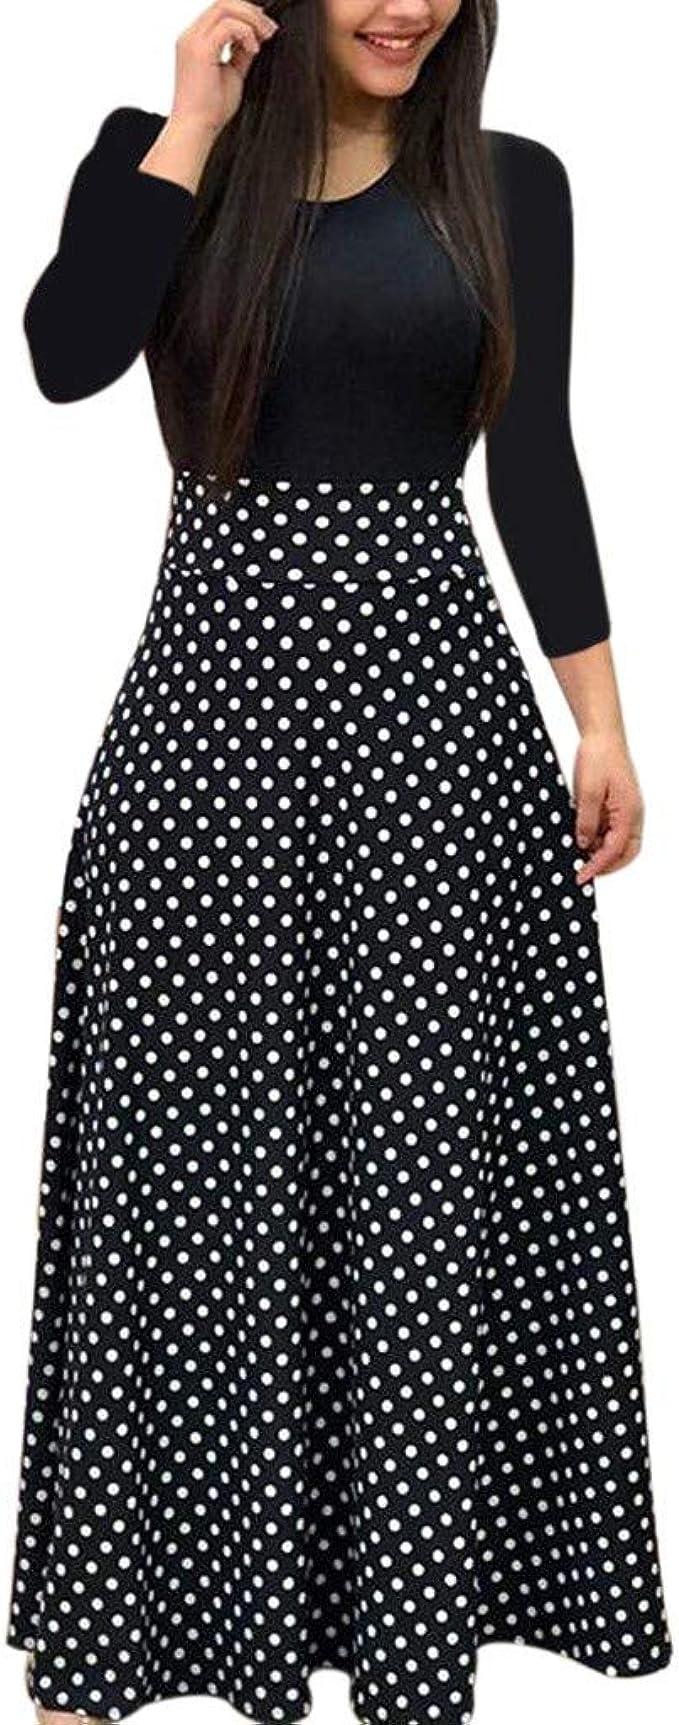 Amazon.com: Xinantime Women Floral Print Maxi Dress Long ...